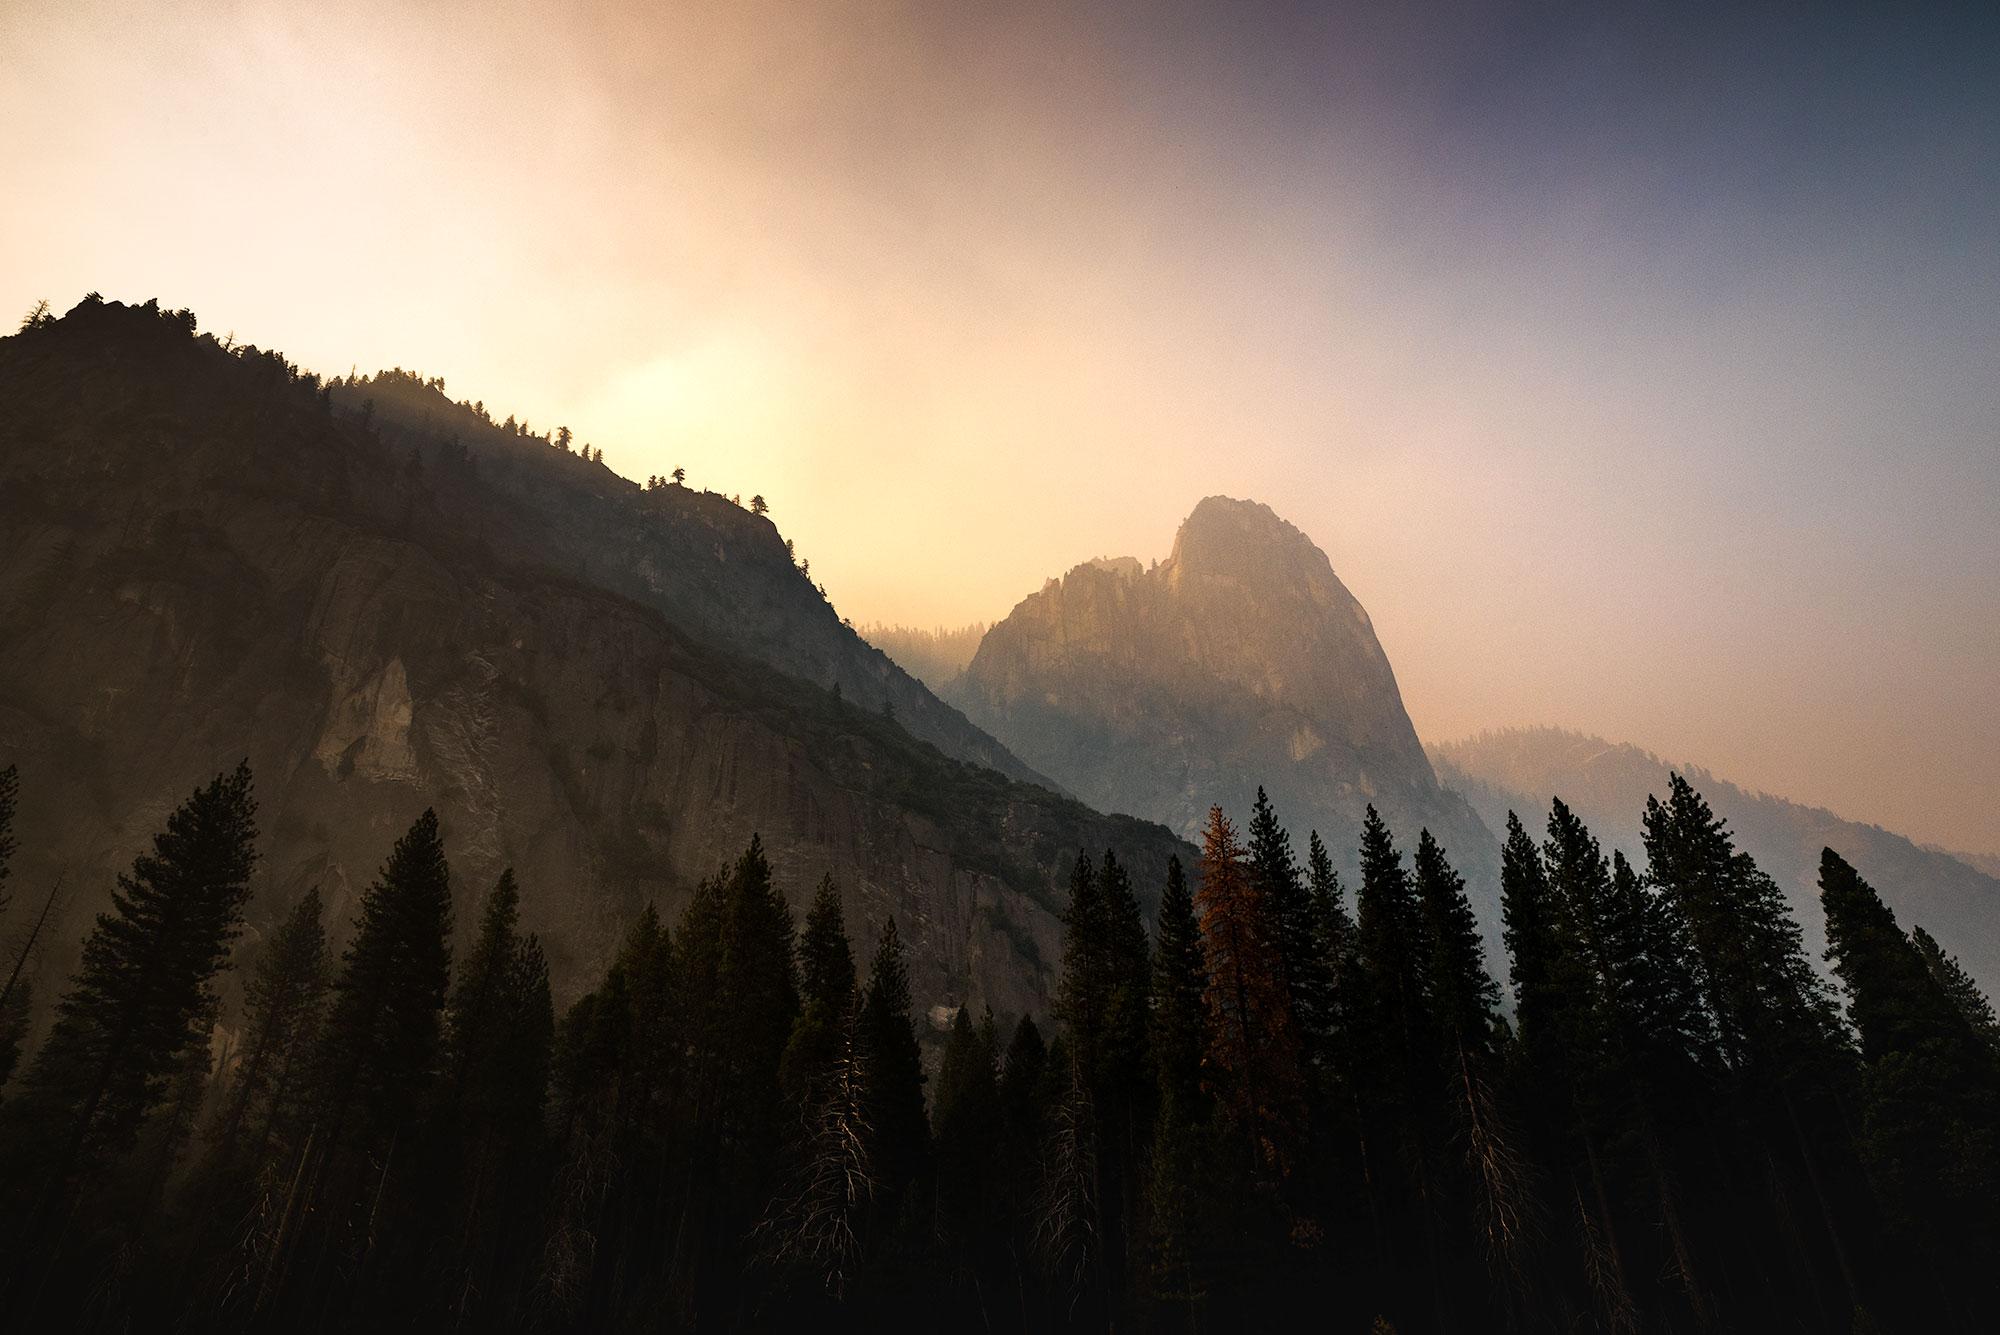 Sunset over El Capitain at Yosemite National Park taken by landscape photographer Jennifer Esseiva.